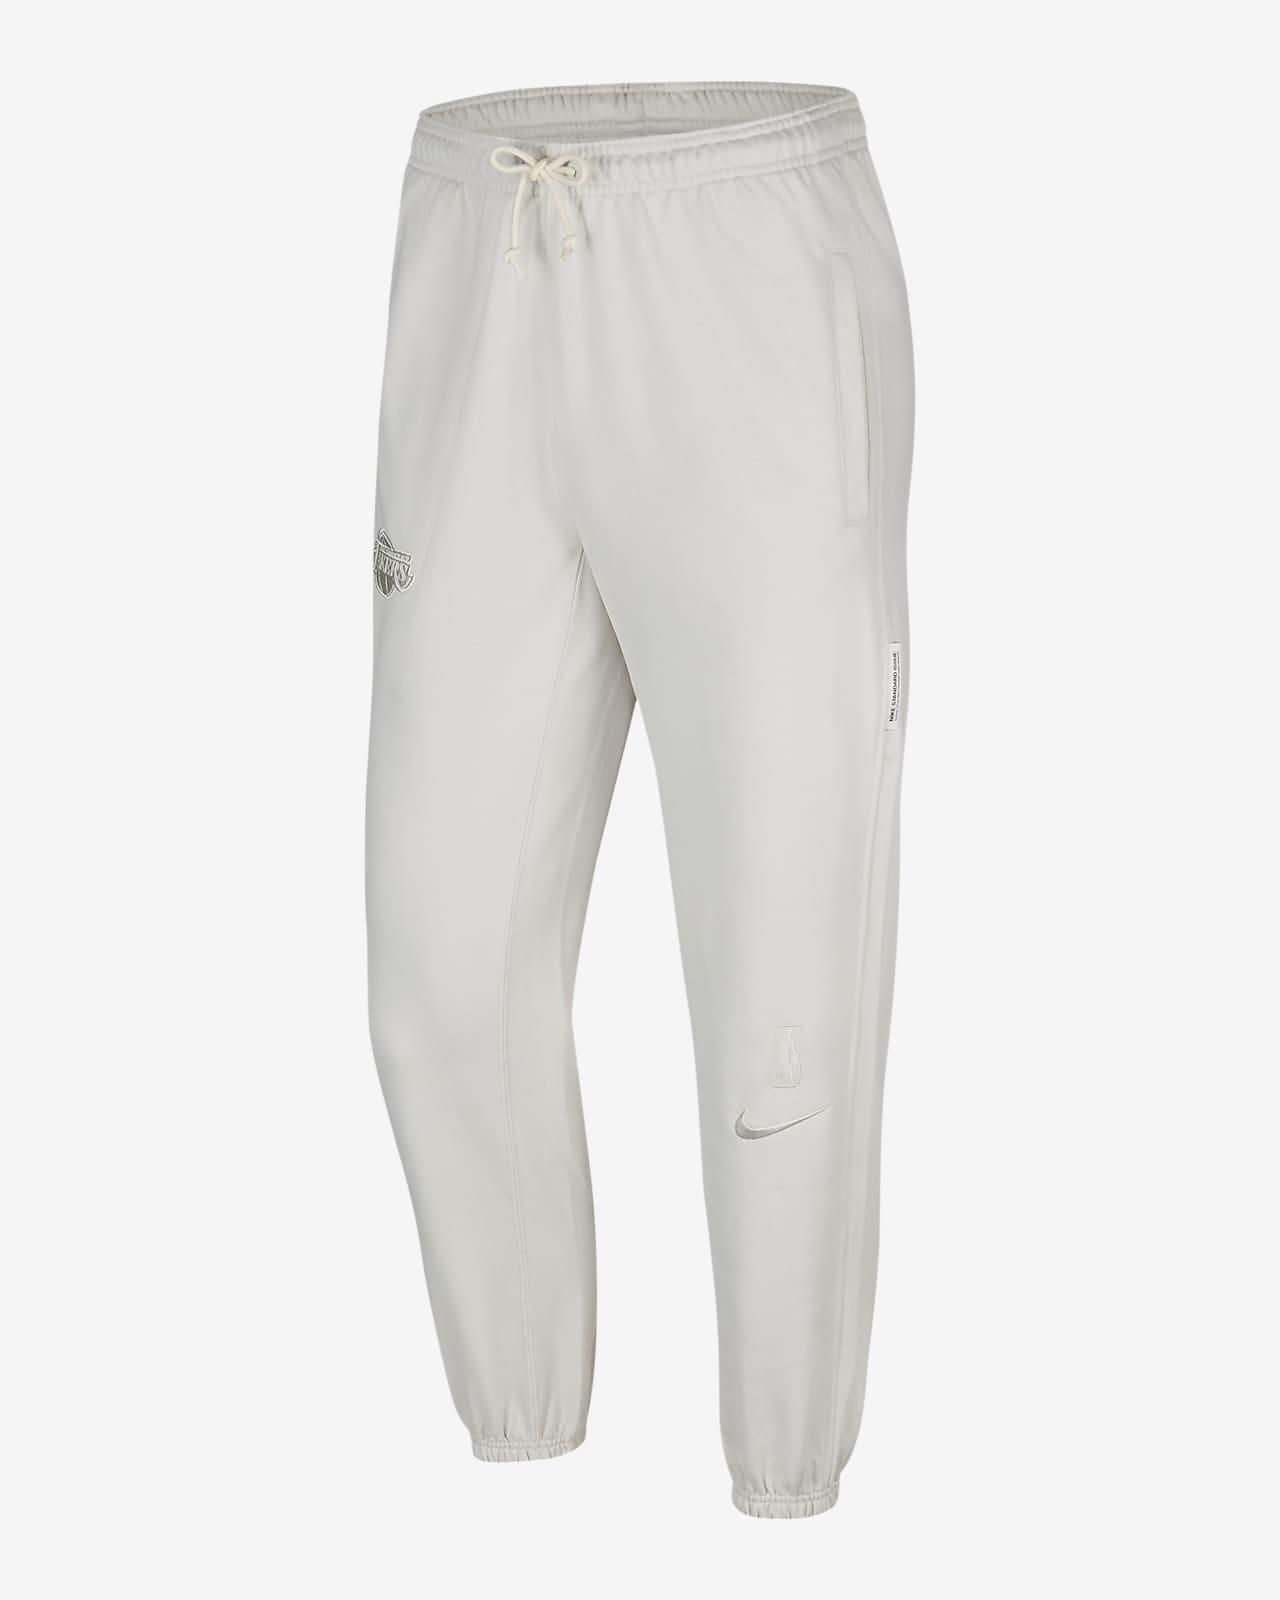 Lakers Standard Issue Nike Dri-FIT NBA-Hose für Herren